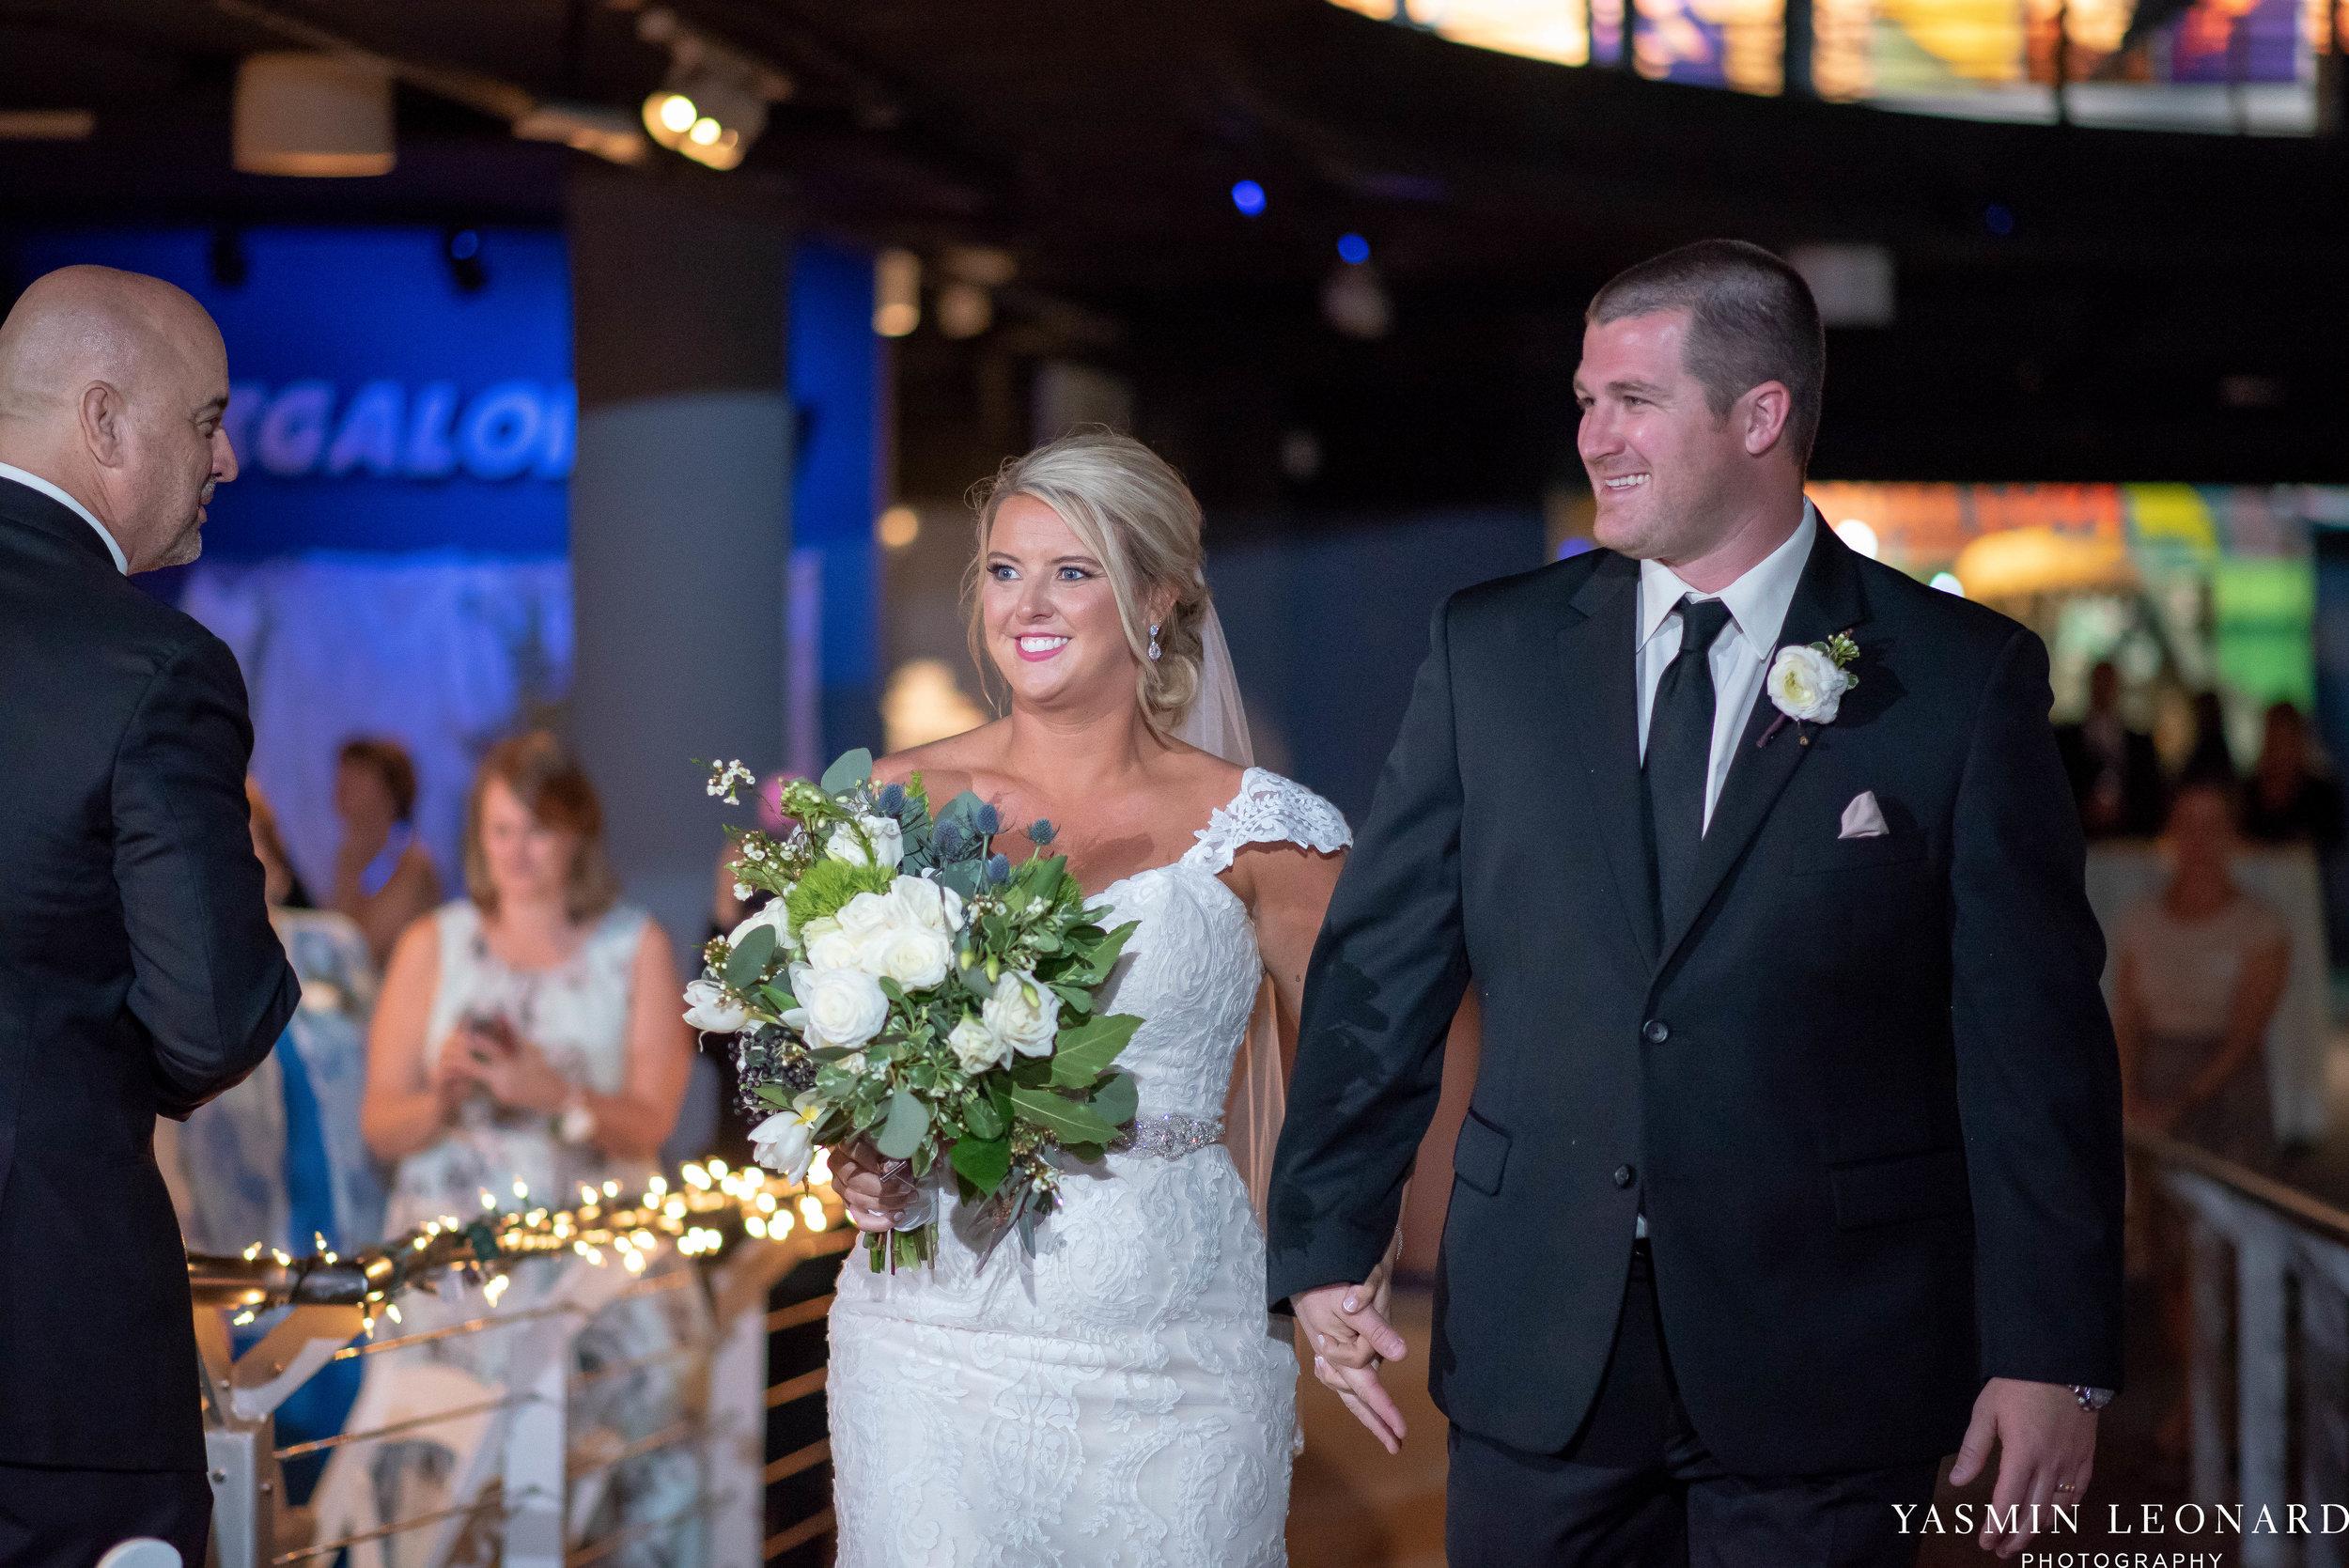 Carolina Beach Wedding - Fort Fisher Wedding - NC Acquarium - Beach Wedding - NC Wedding - Beach Wedding Inspiration - Beach Bride-40.jpg